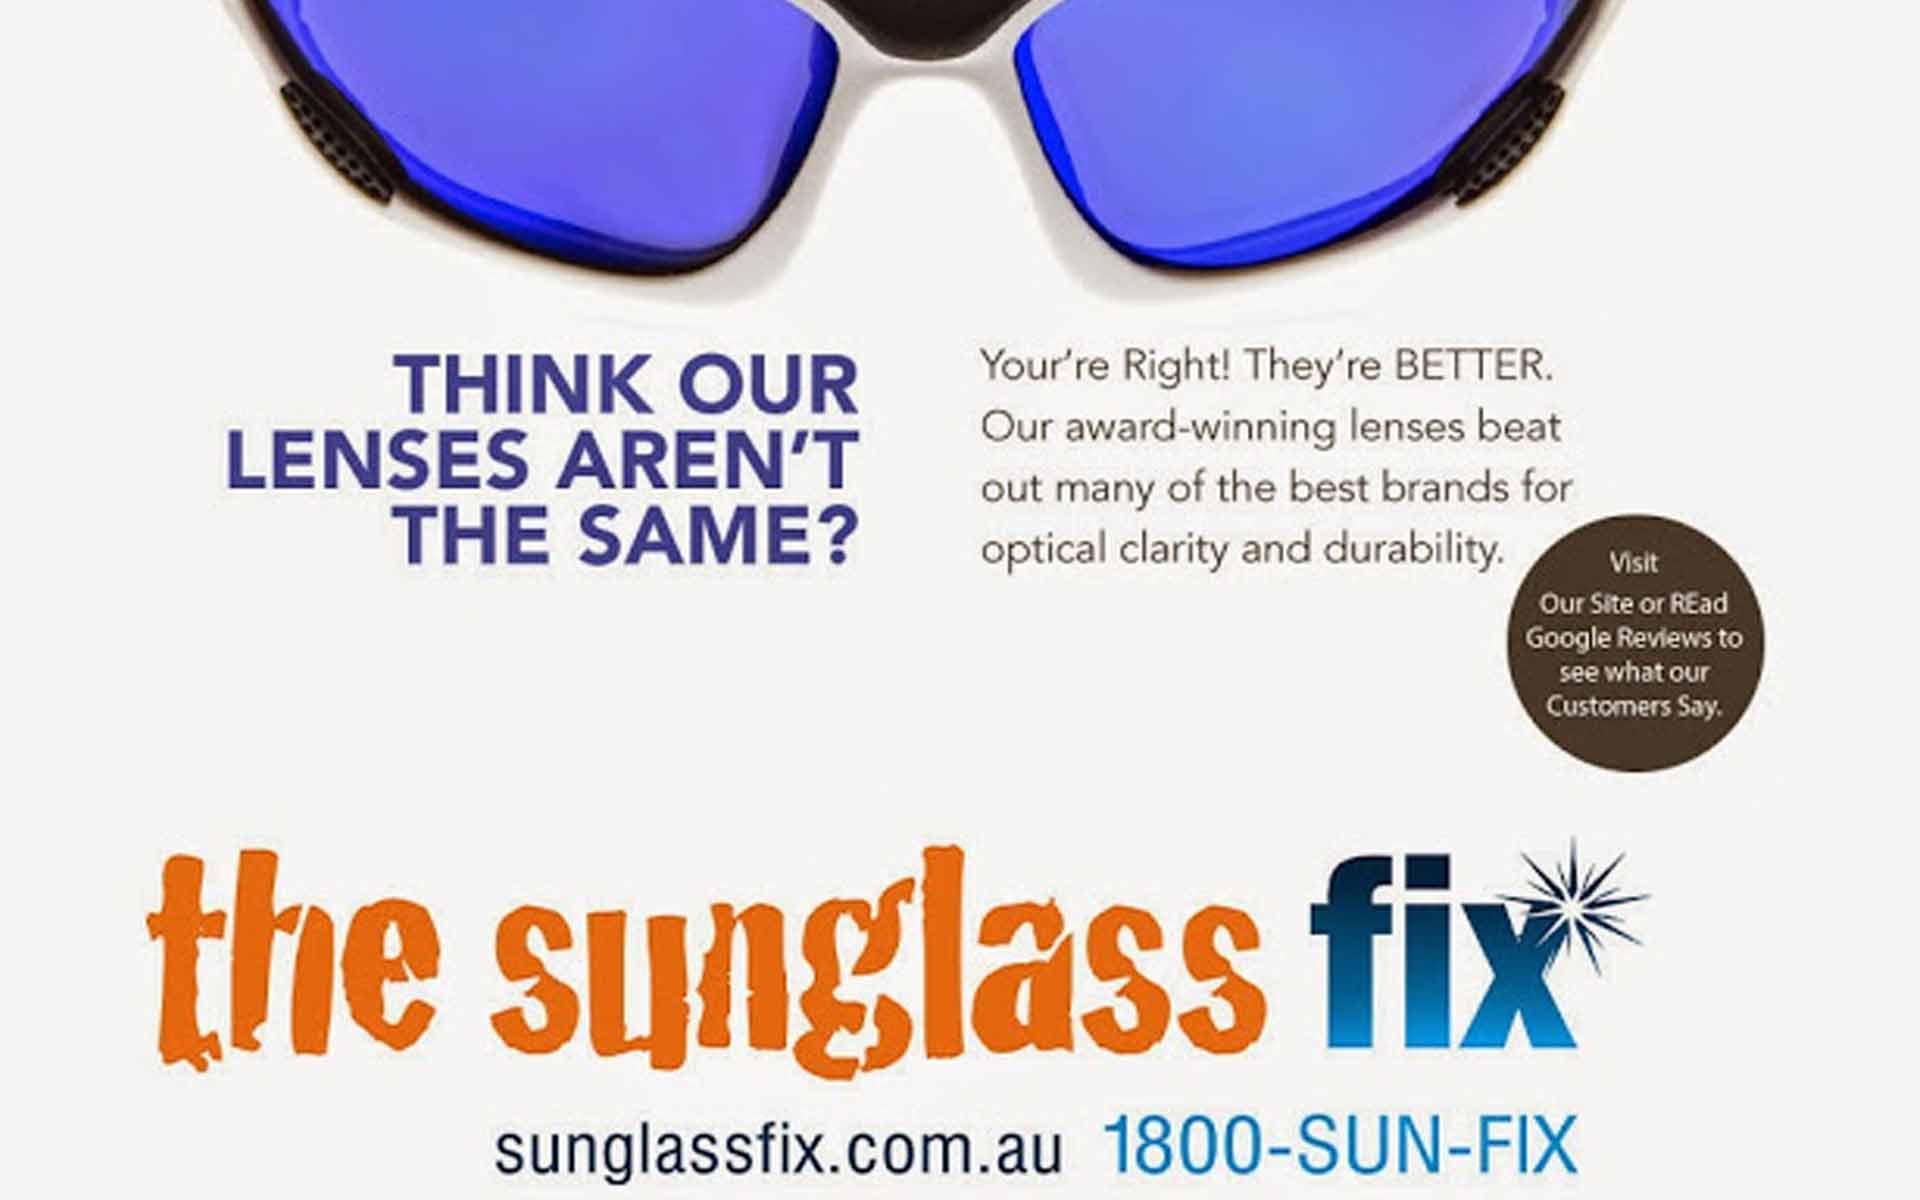 8e525c5adca0 The Sunglass Fix Named A Company To Watch